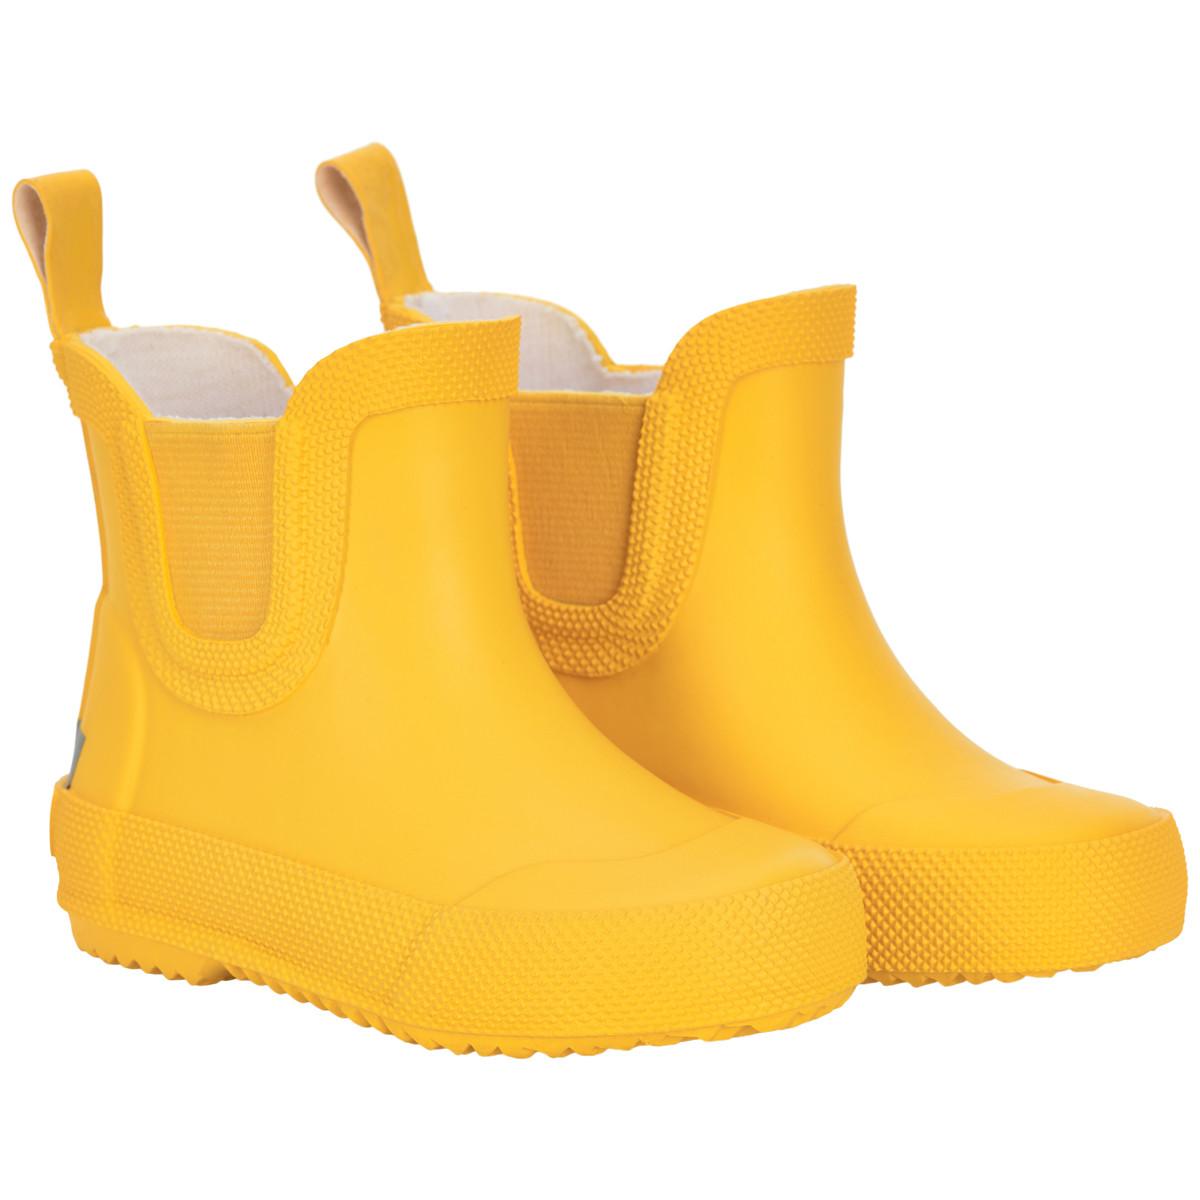 CeLaVi 4988 gummistøvle, yellow, 24